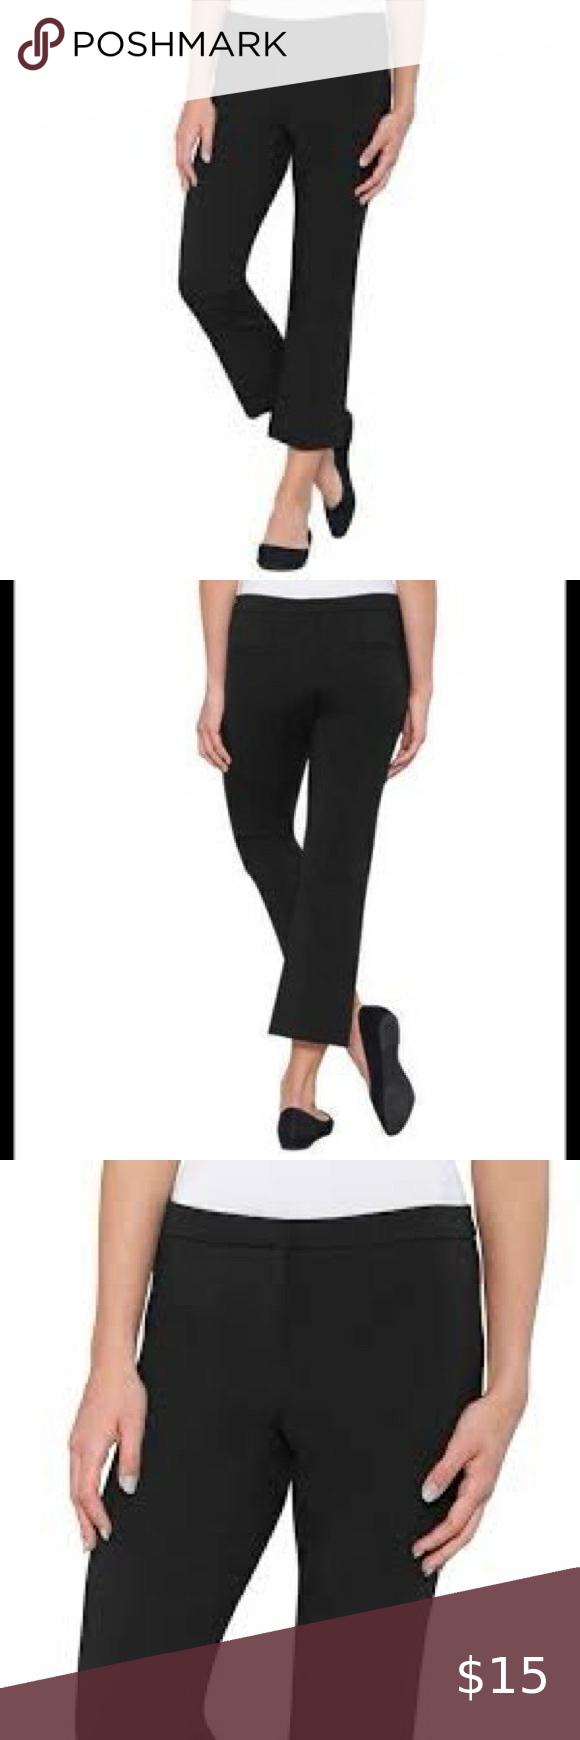 Max Mia Crop Dress Work Pants Size Medium Capri Dress Pants Crop Dress Dresses For Work [ 1740 x 580 Pixel ]